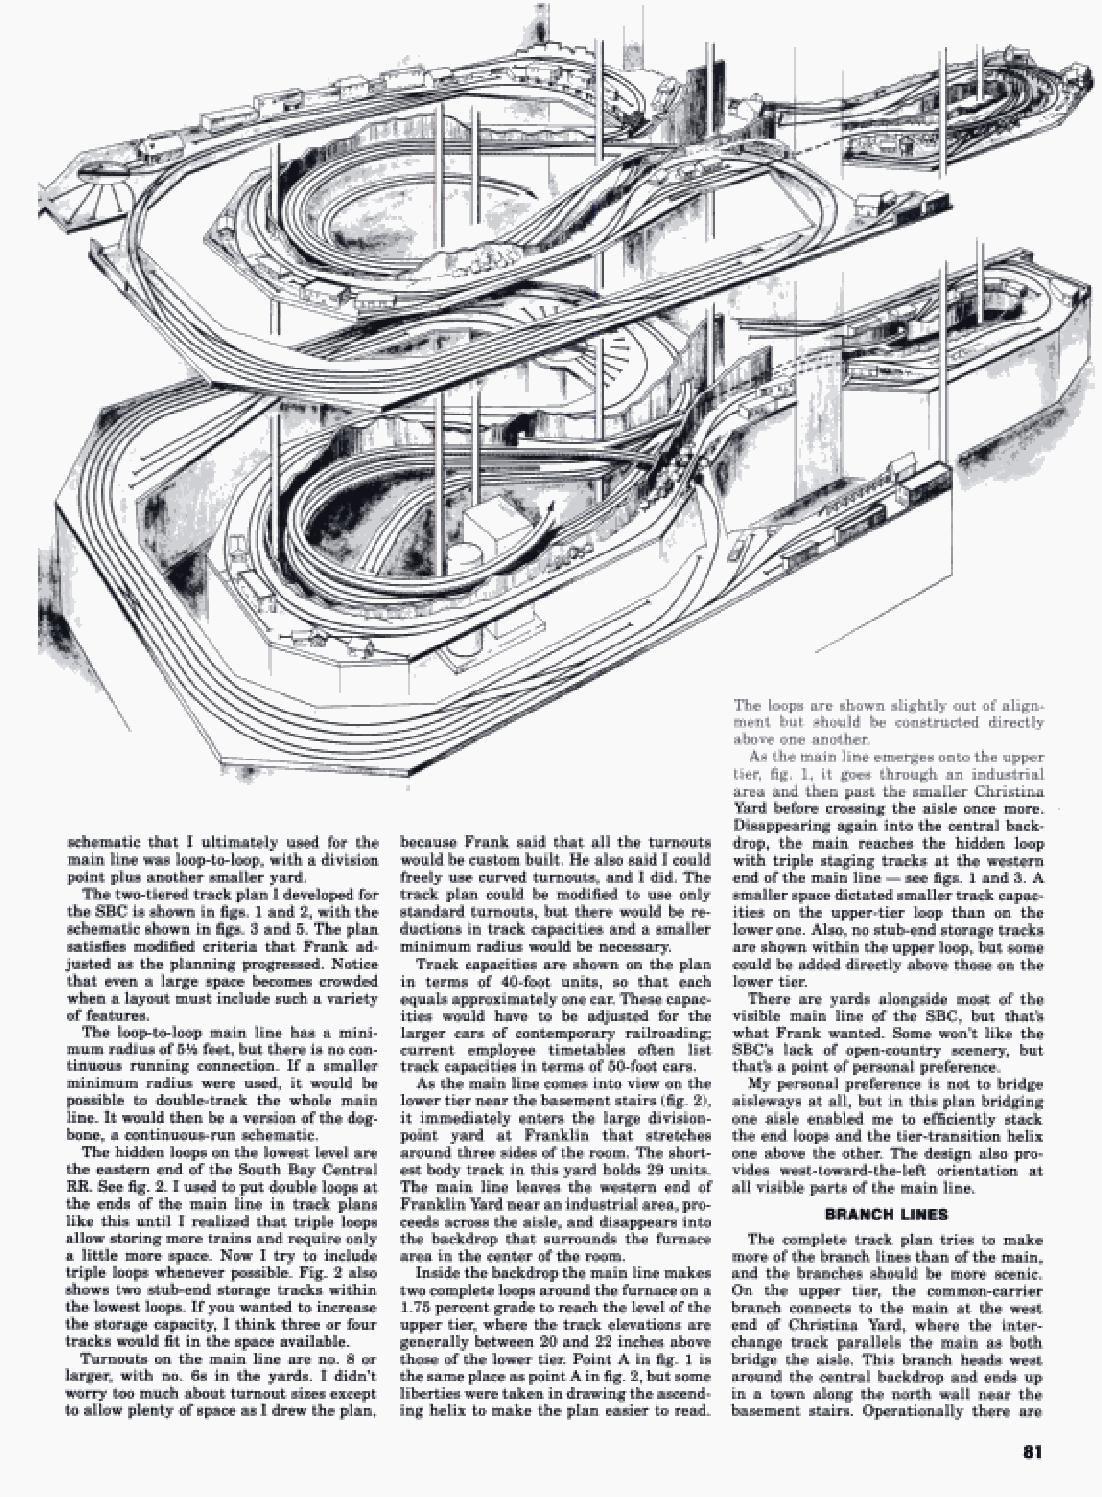 48 Top Notch Track Plans In 2020 Model Railway Track Plans Train Layouts Model Railway